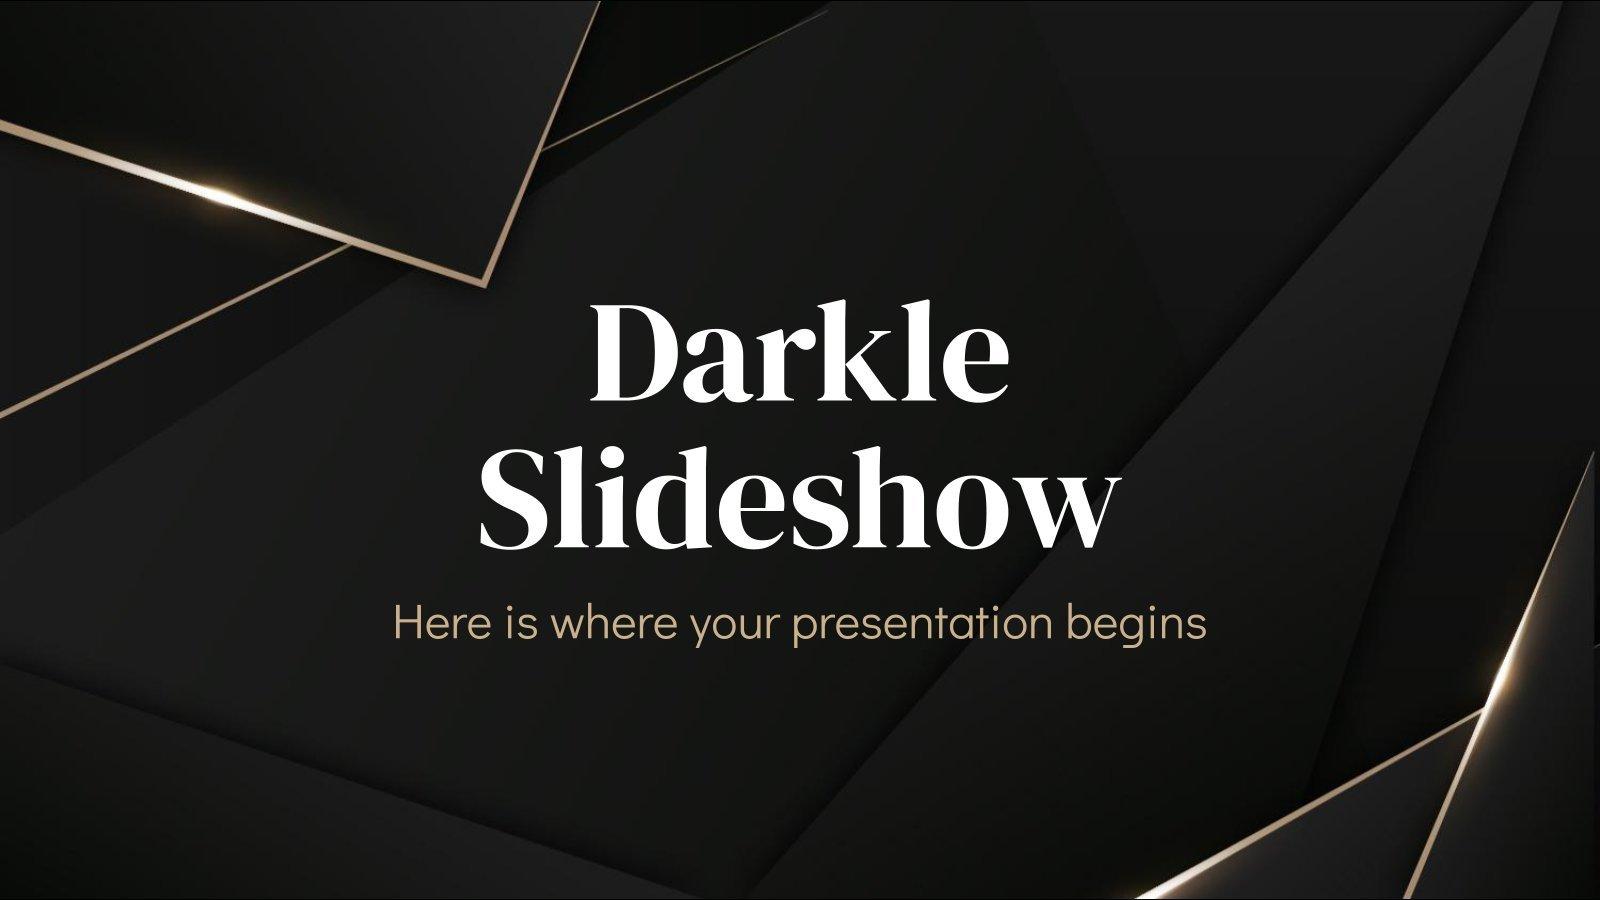 Darkle Slideshow presentation template